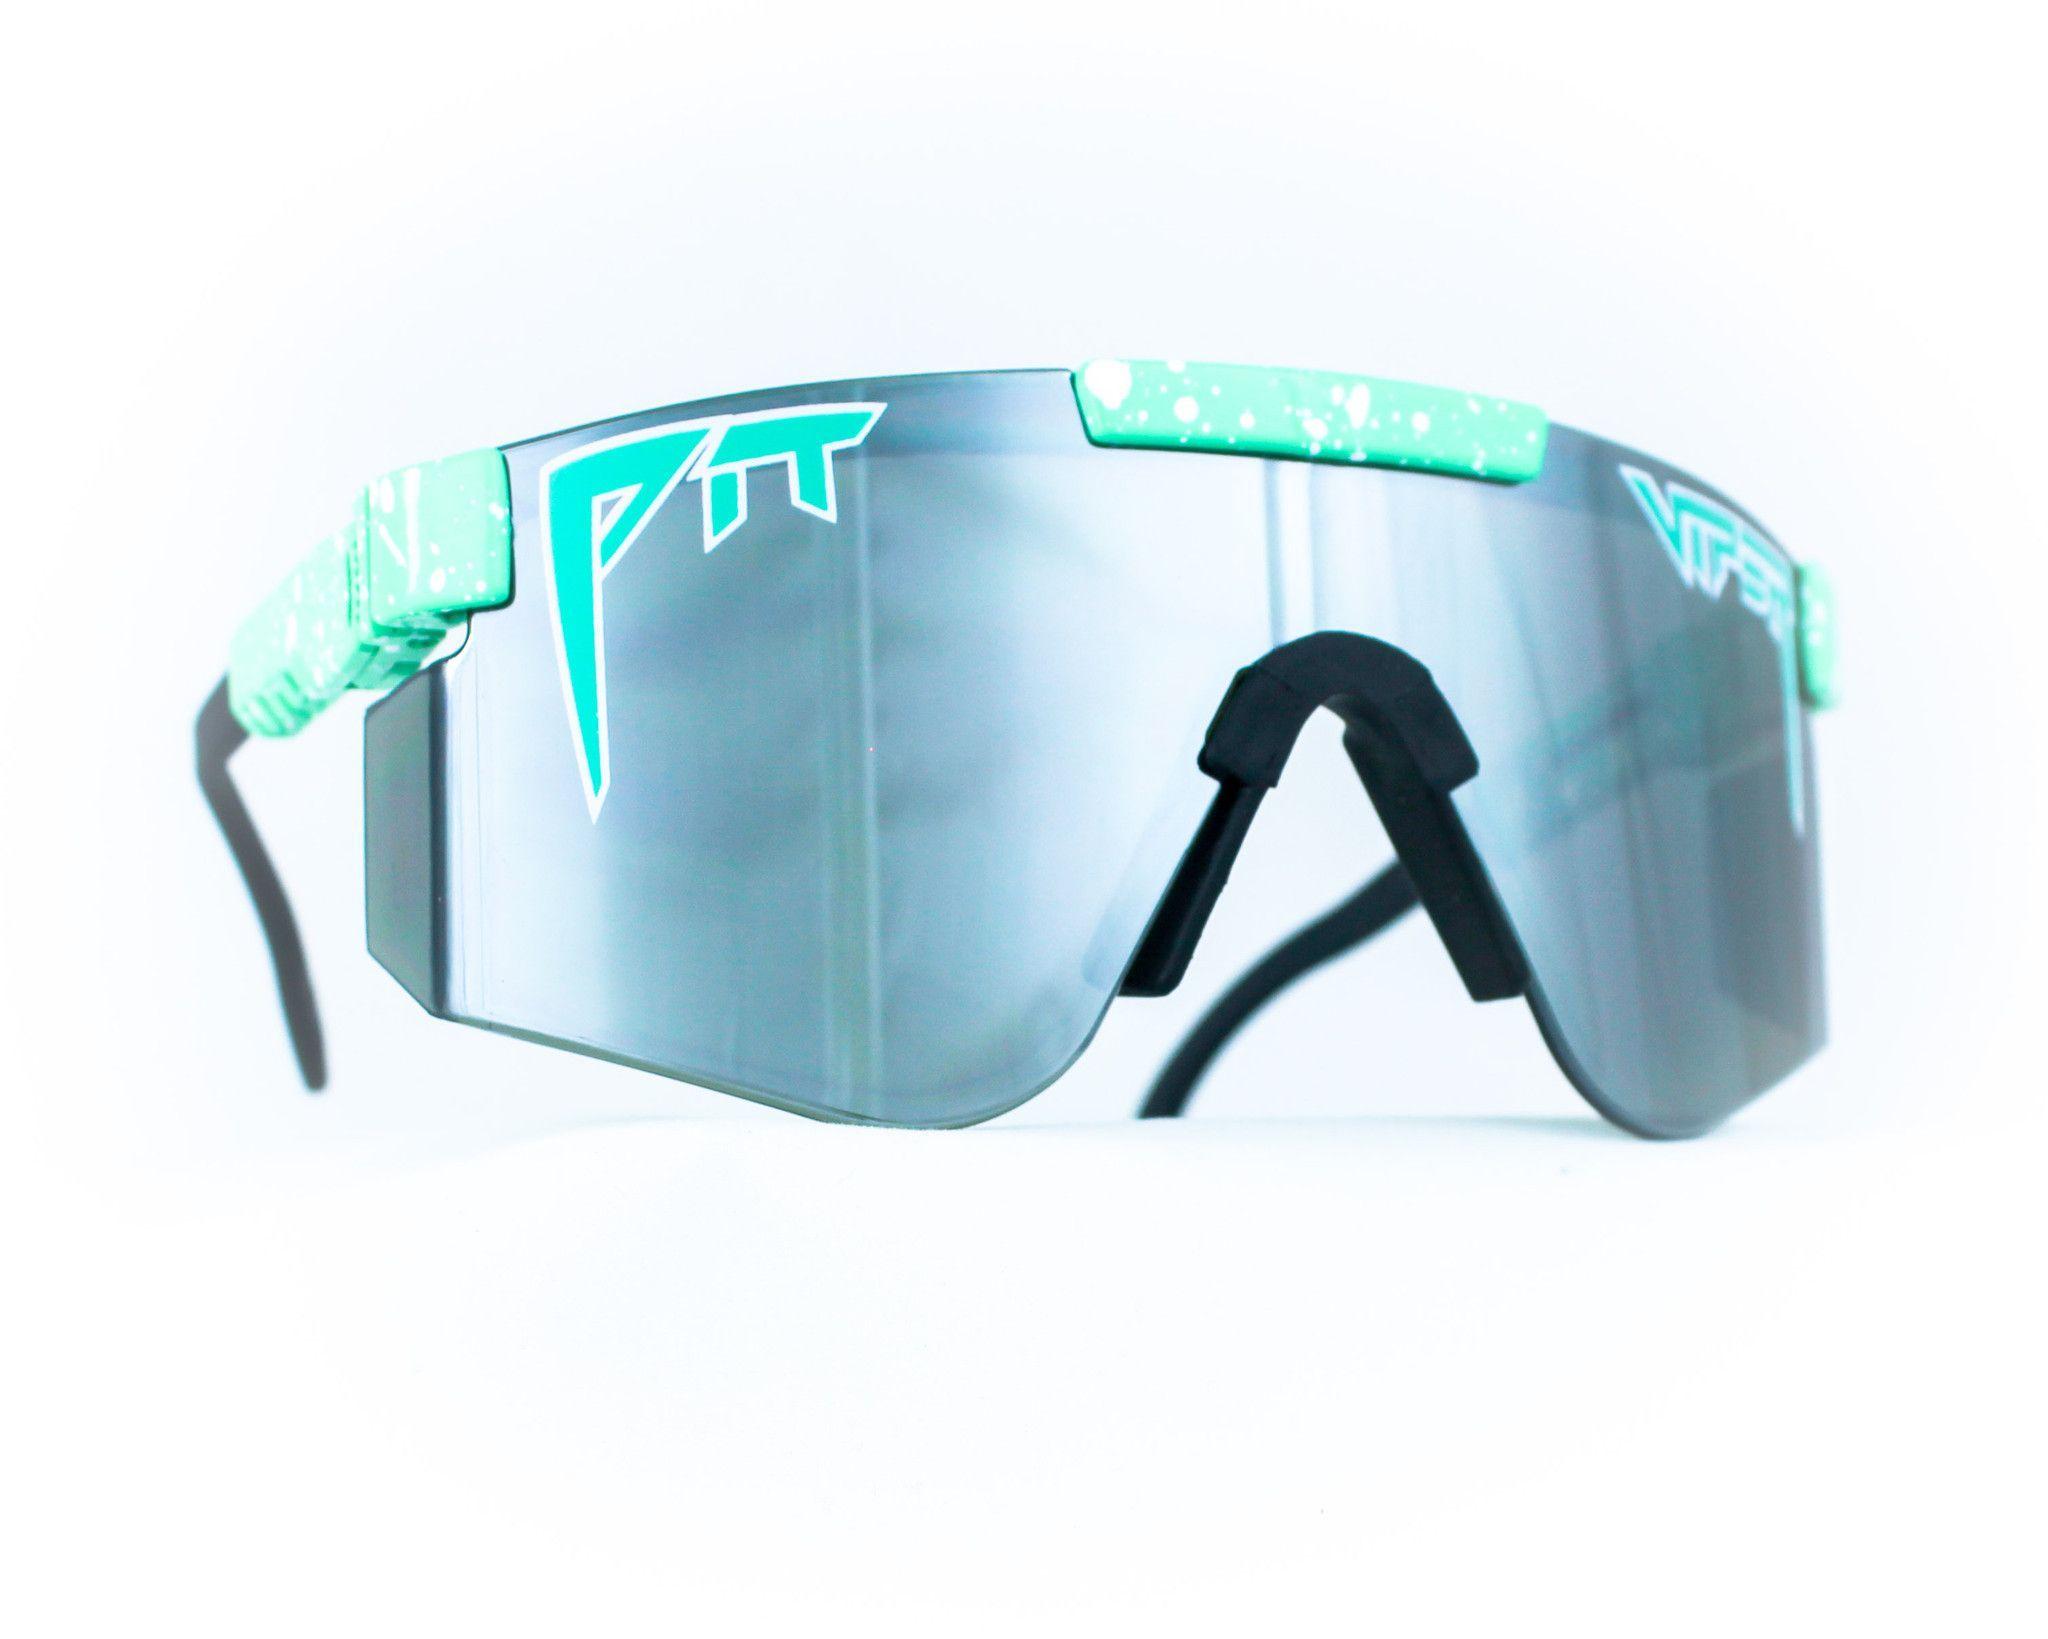 6d4863270d40 THE POSEIDON MIRROR. THE POSEIDON MIRROR Pit Viper Sunglasses ...